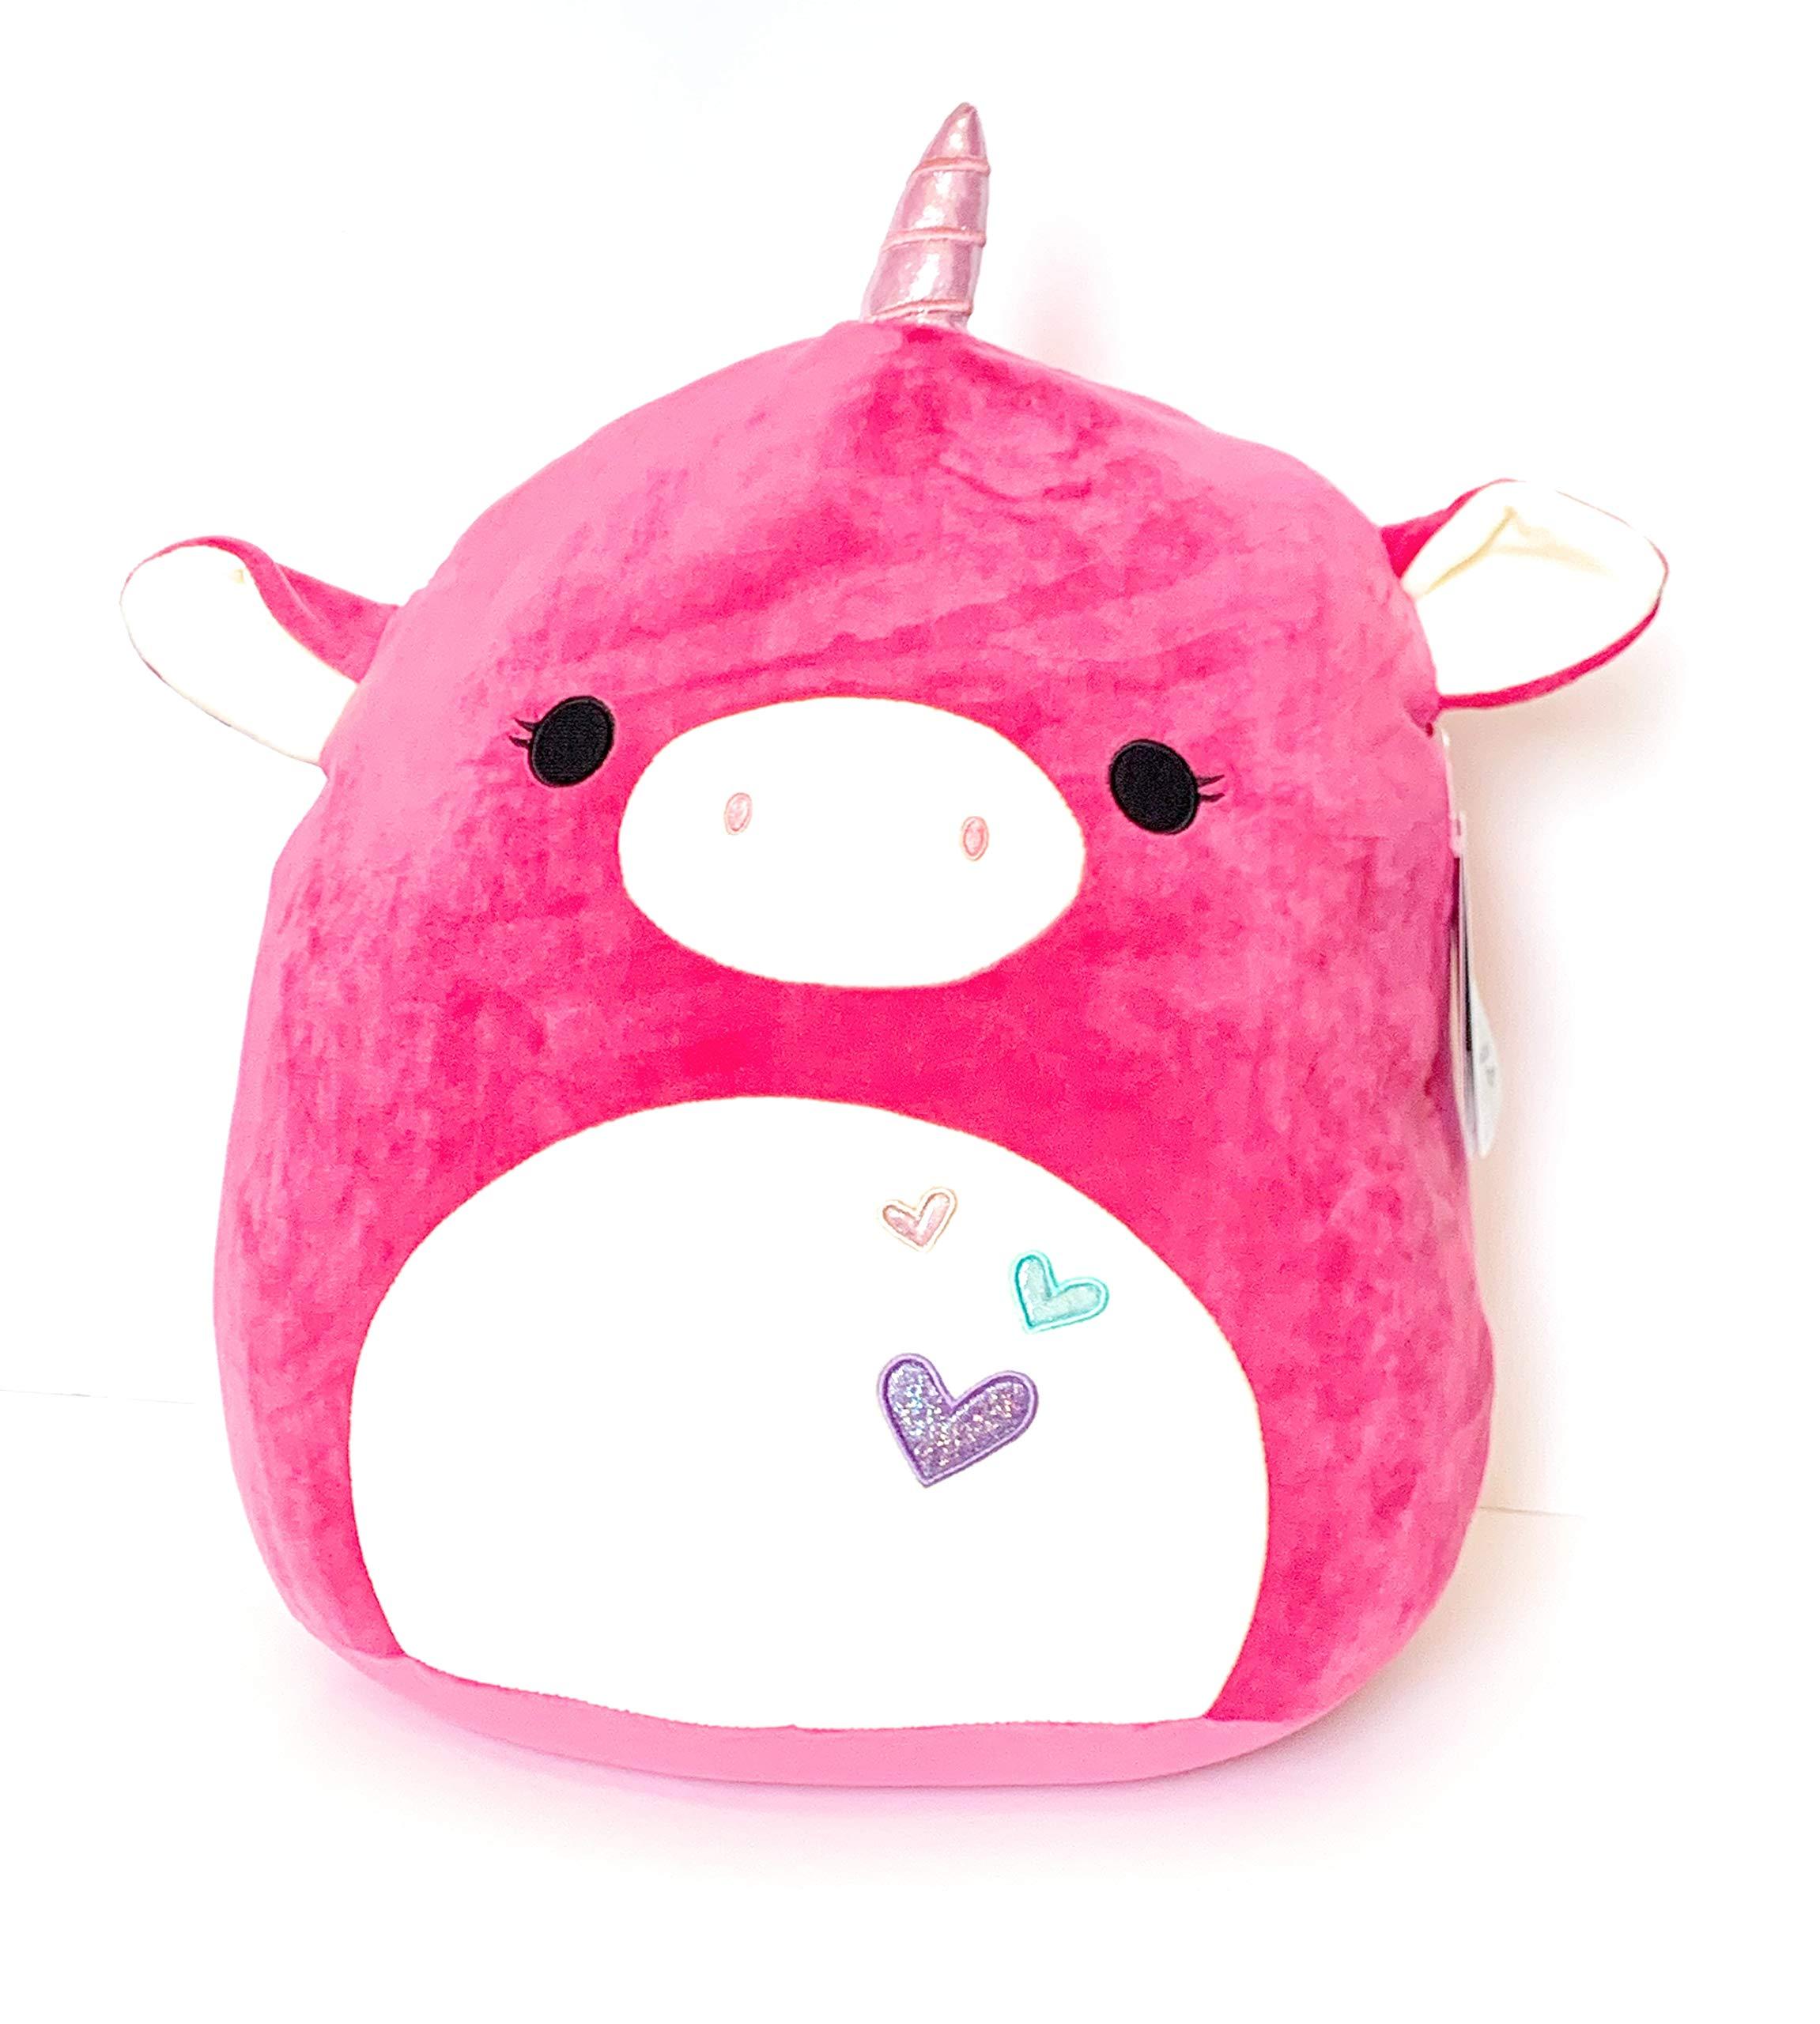 Squishmallows 16'' Avery The Pink Valentine Unicorn Stuffed Animal Plush Pillow